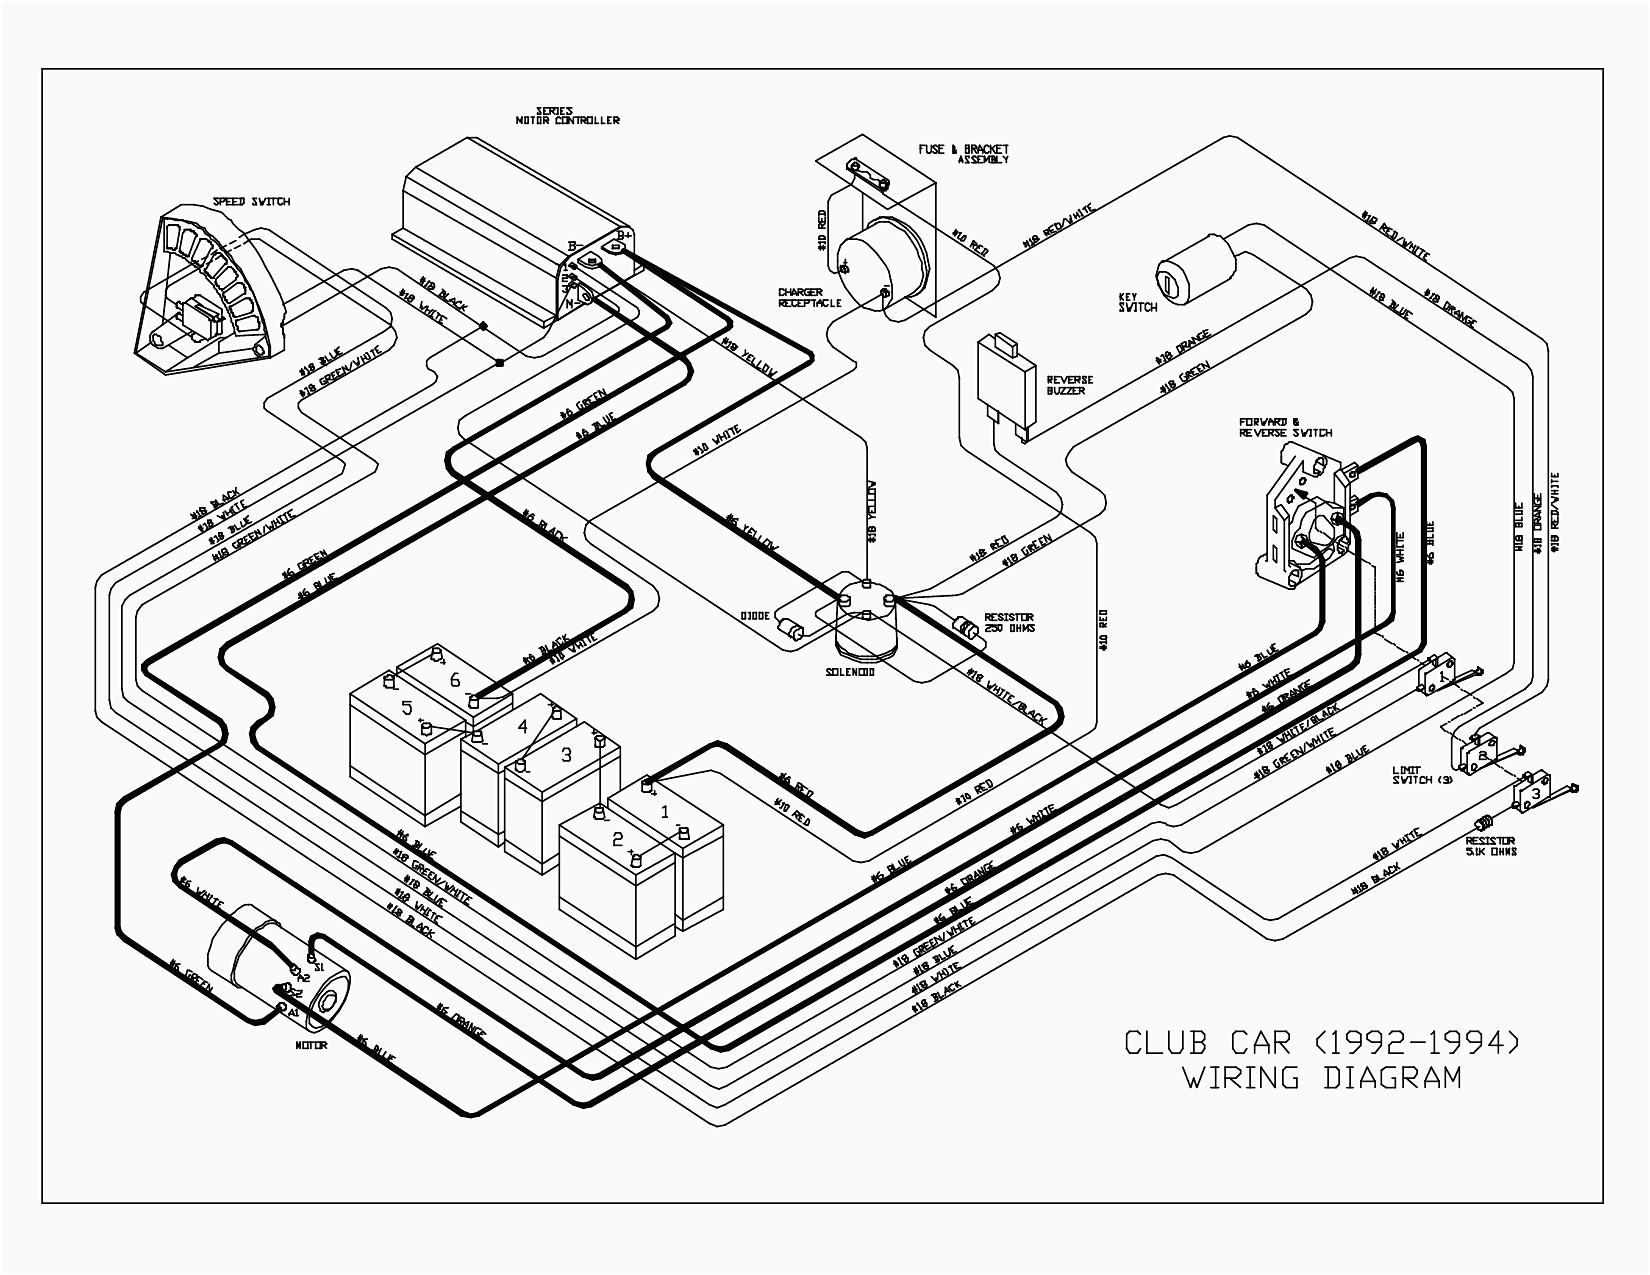 Diagram Of Club Car Parts Ingersoll Rand Club Car Wiring Diagram In Luxury Parts 43 Inside Of Diagram Of Club Car Parts